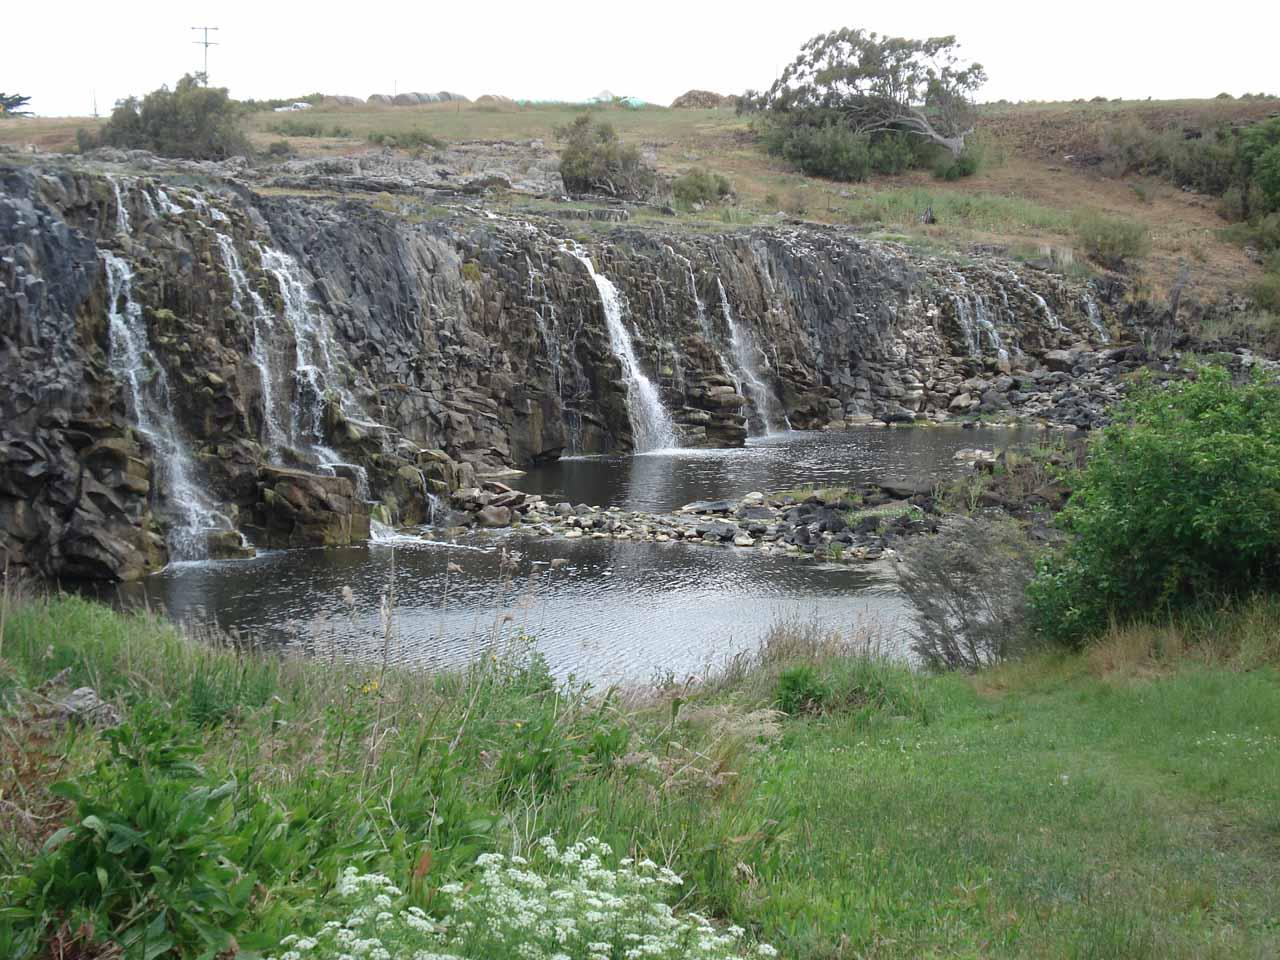 Looking right at the Hopkins Falls near its base